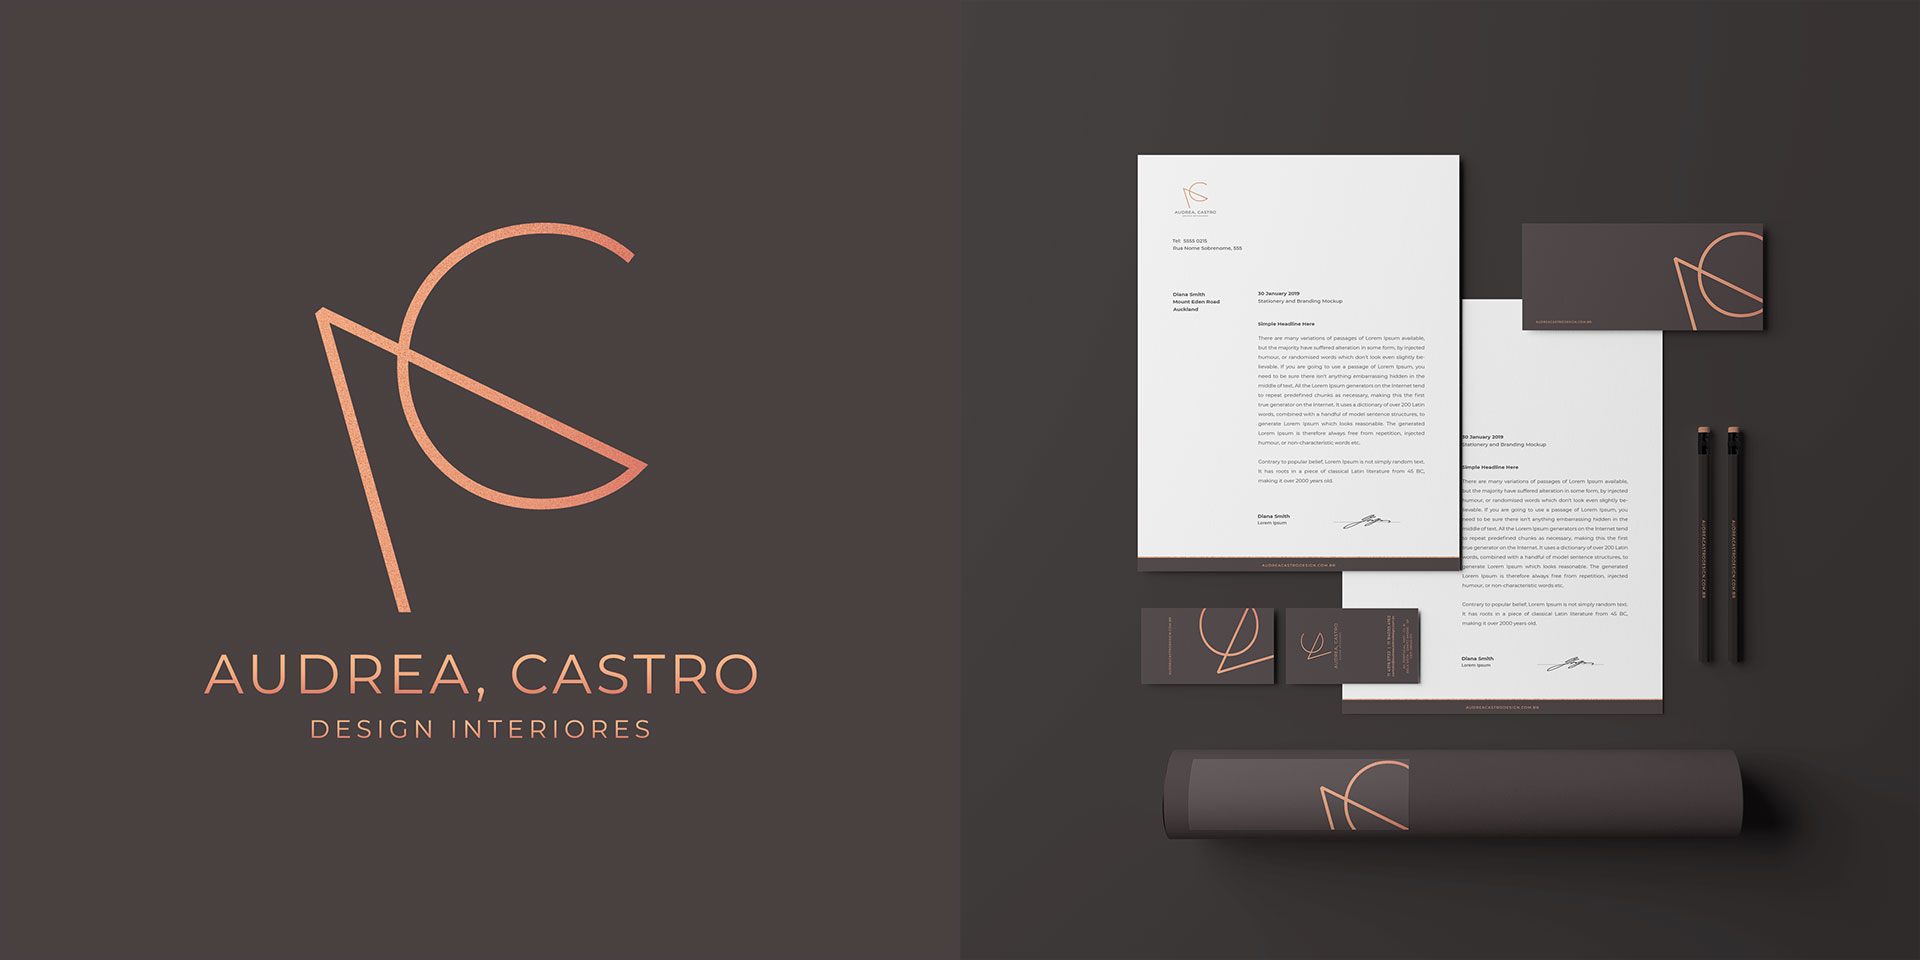 Audrea Castro Design Interiores Branding